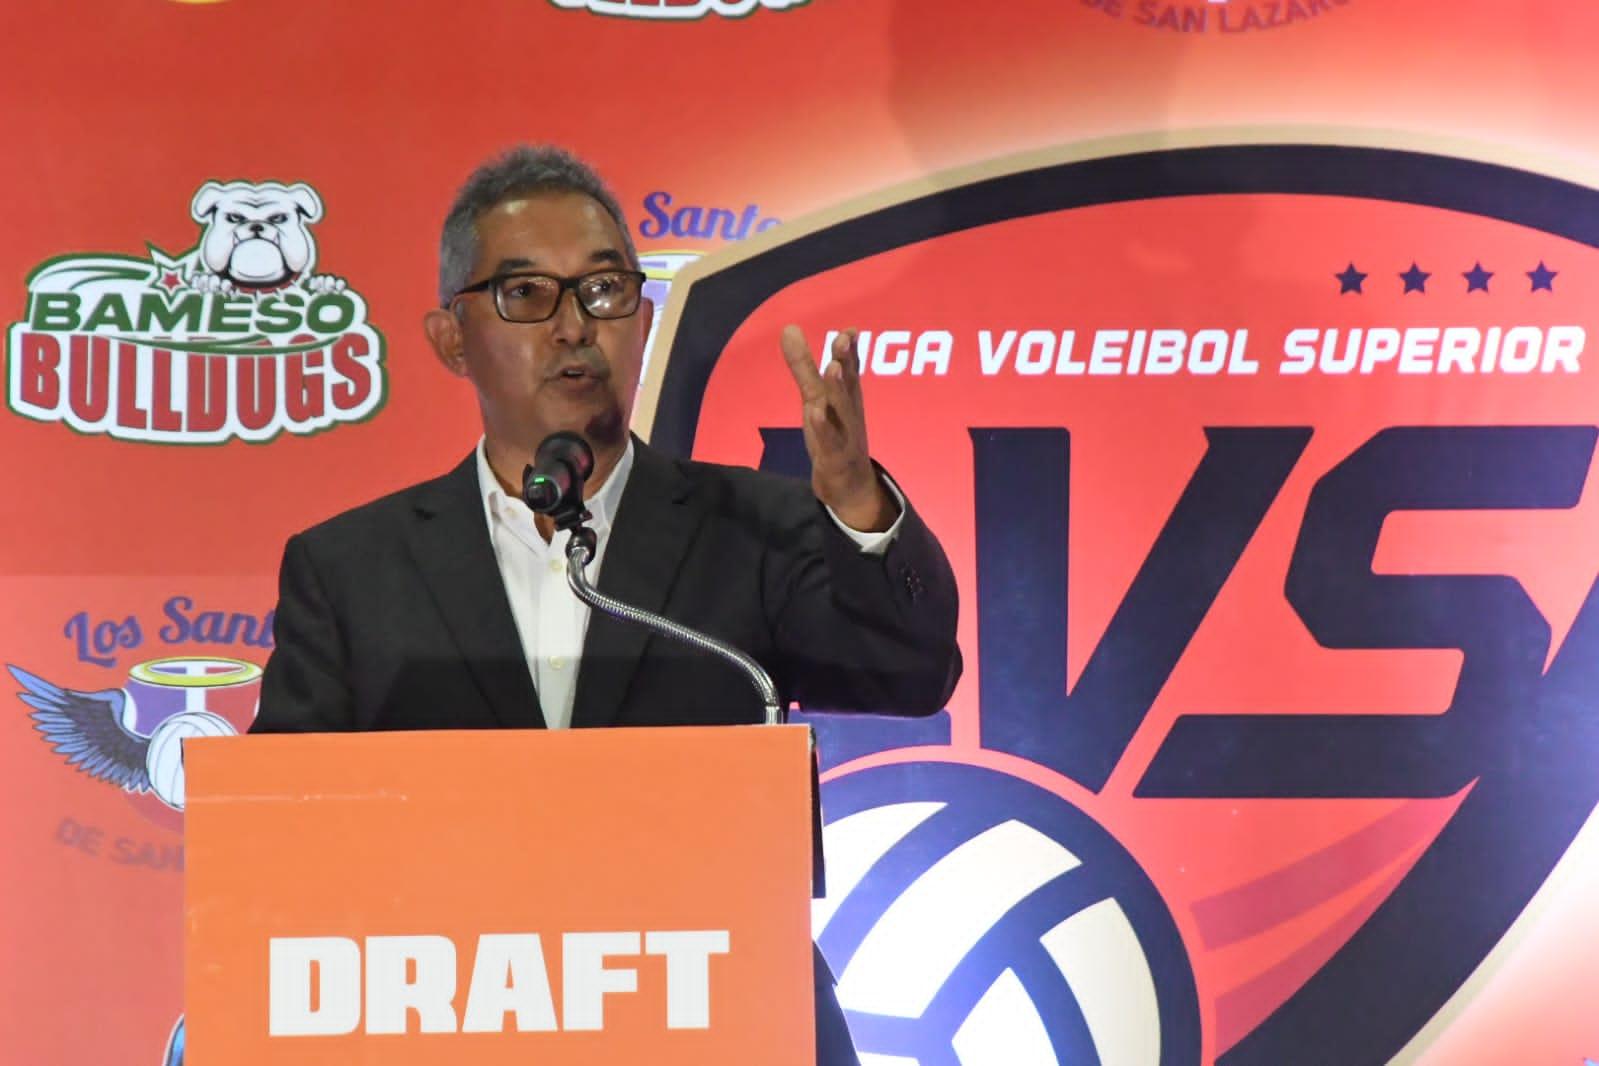 Tercera edición de Liga de Voleibol Superior iniciará 5 de noviembre